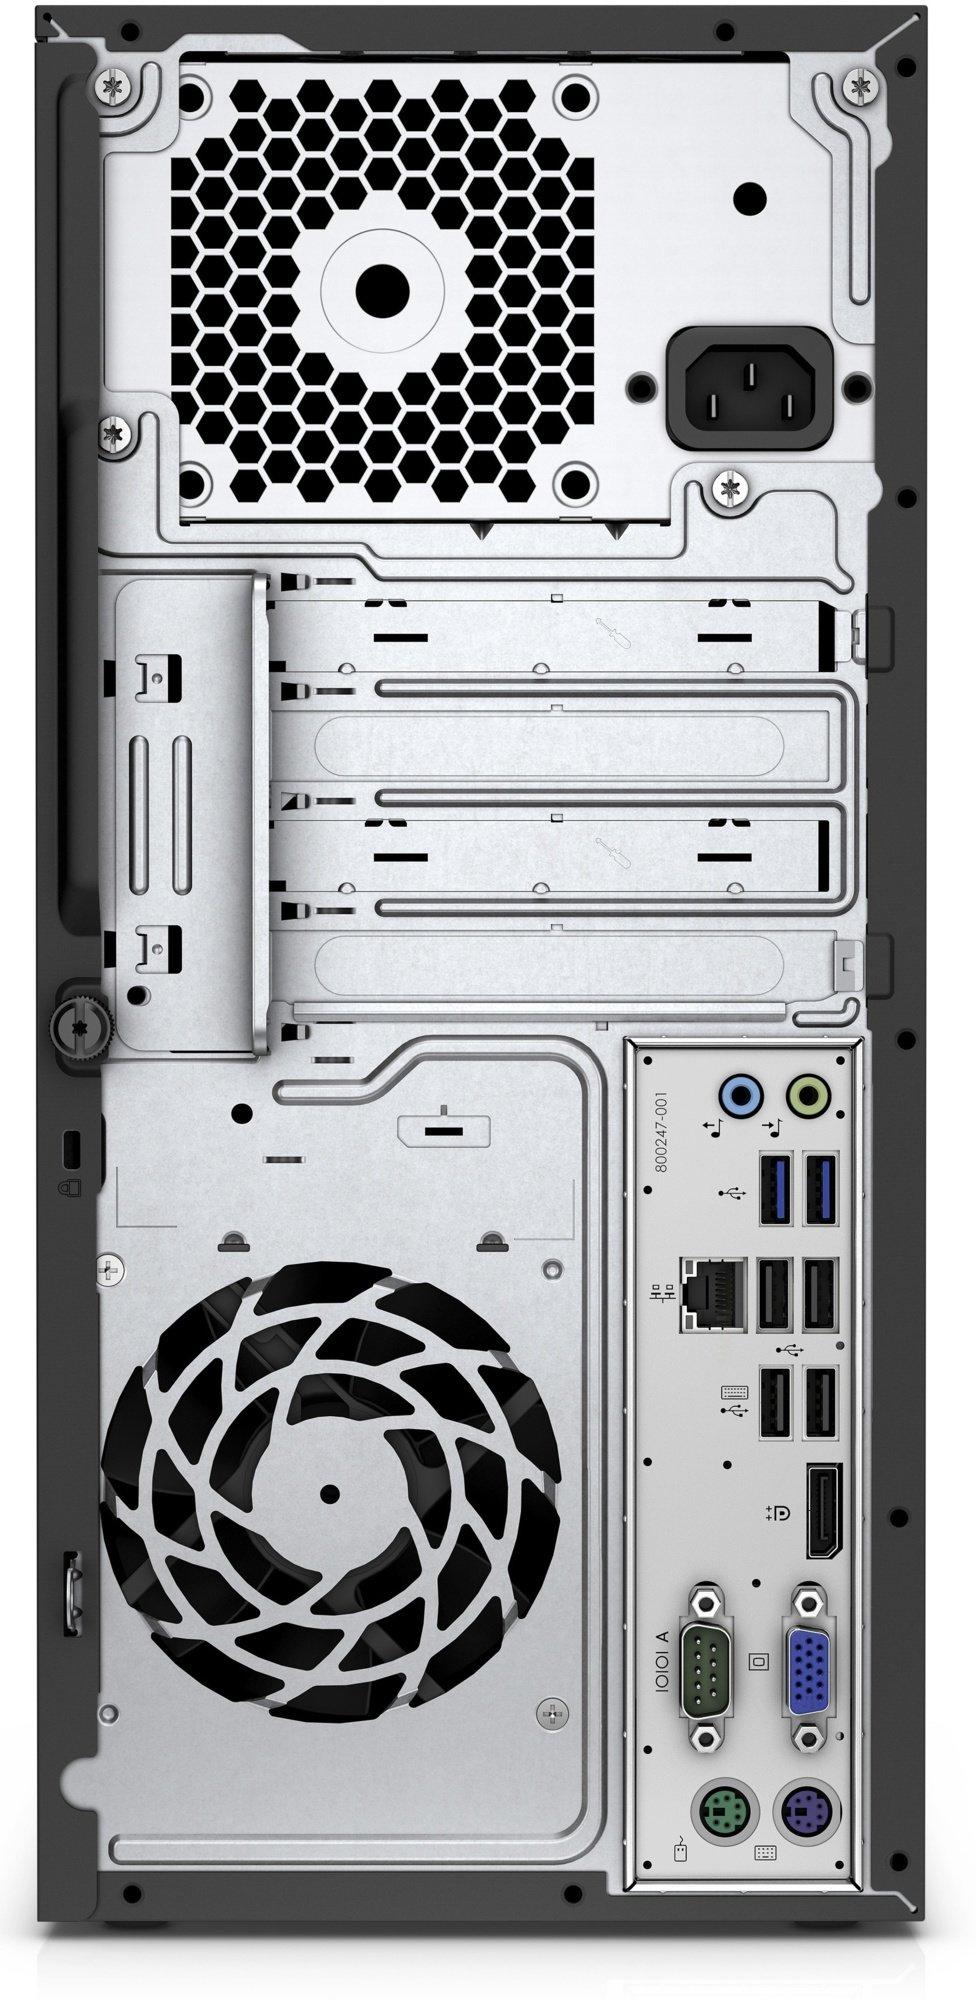 HP Prodesk 400 G3 MiniTower